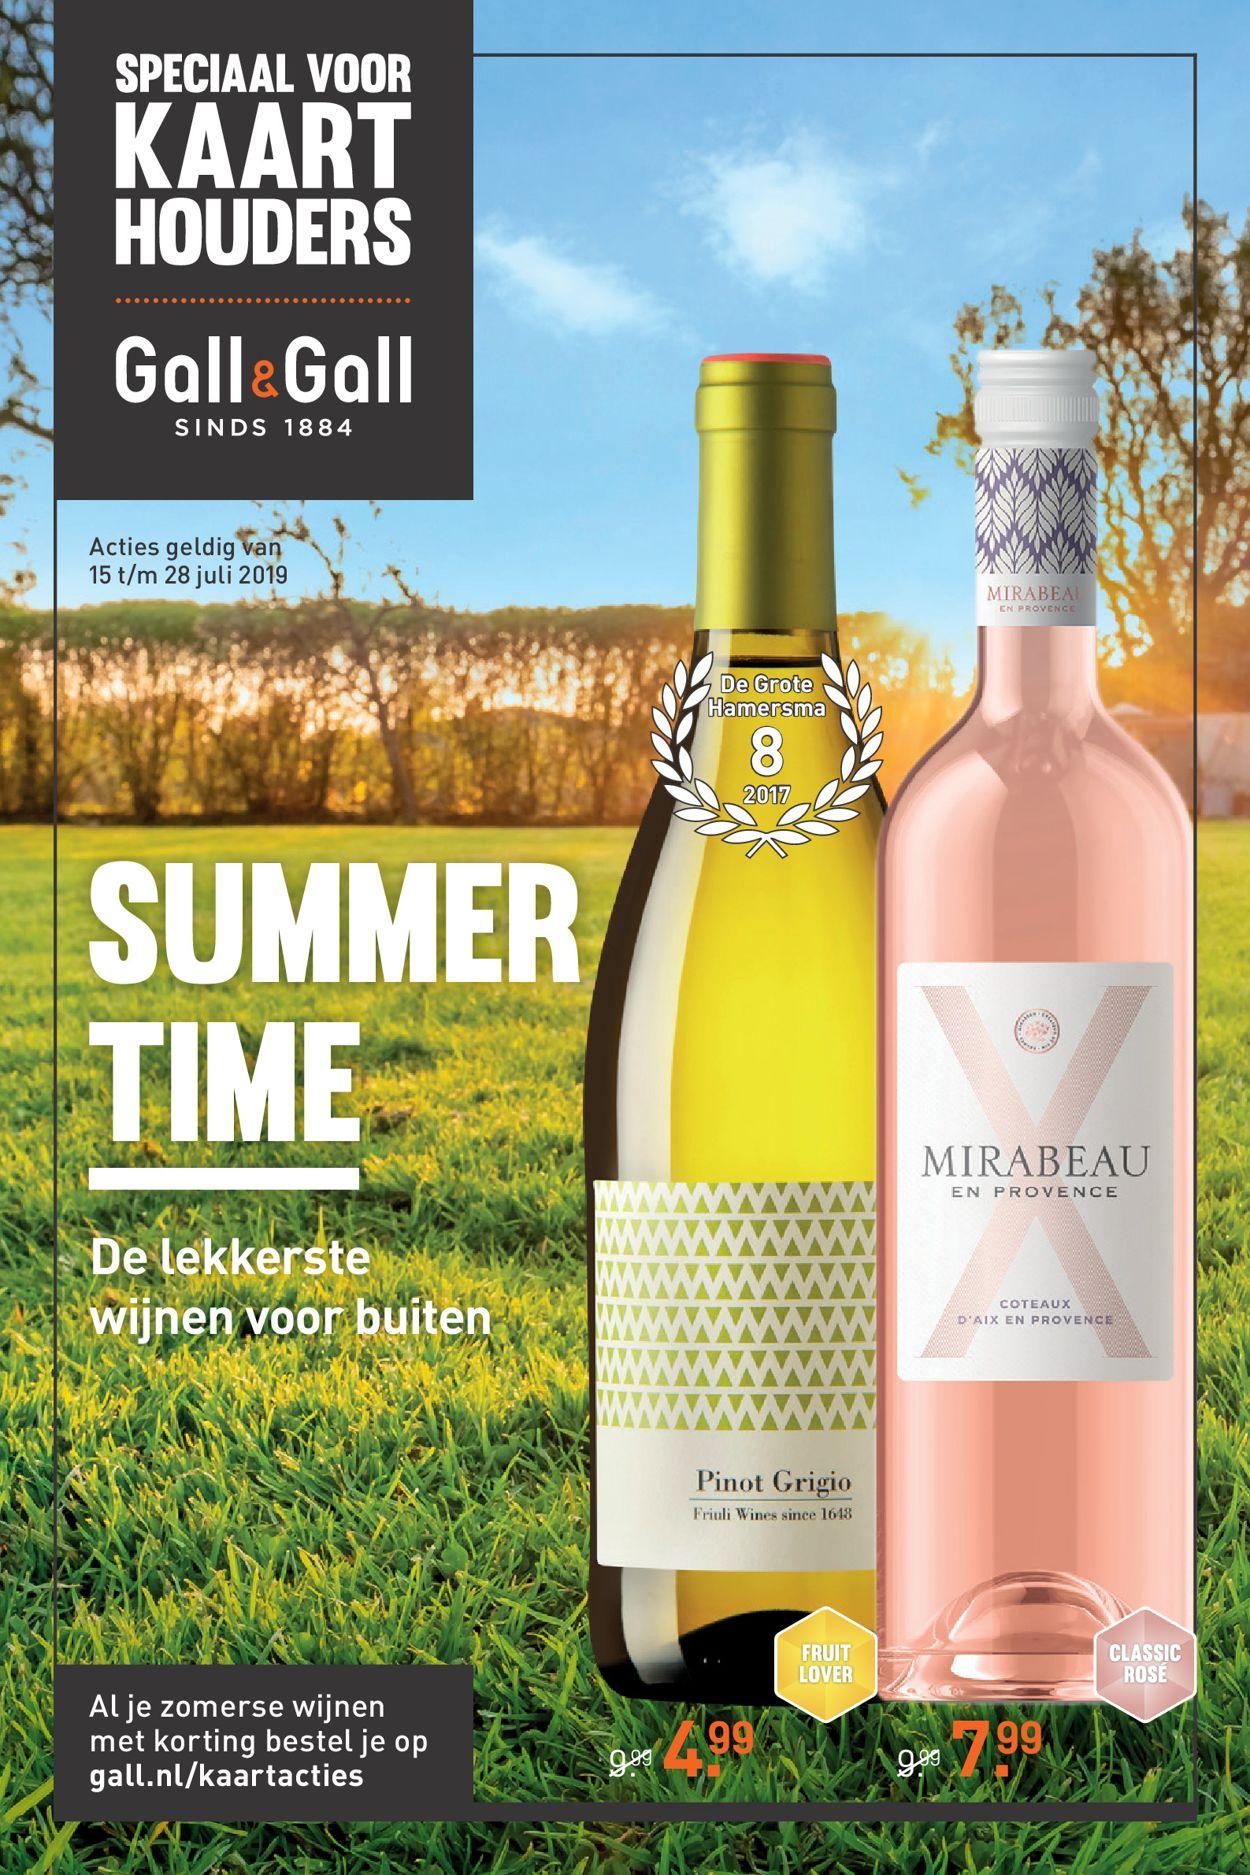 Gall & Gall Folder - 15.07-28.07.2019